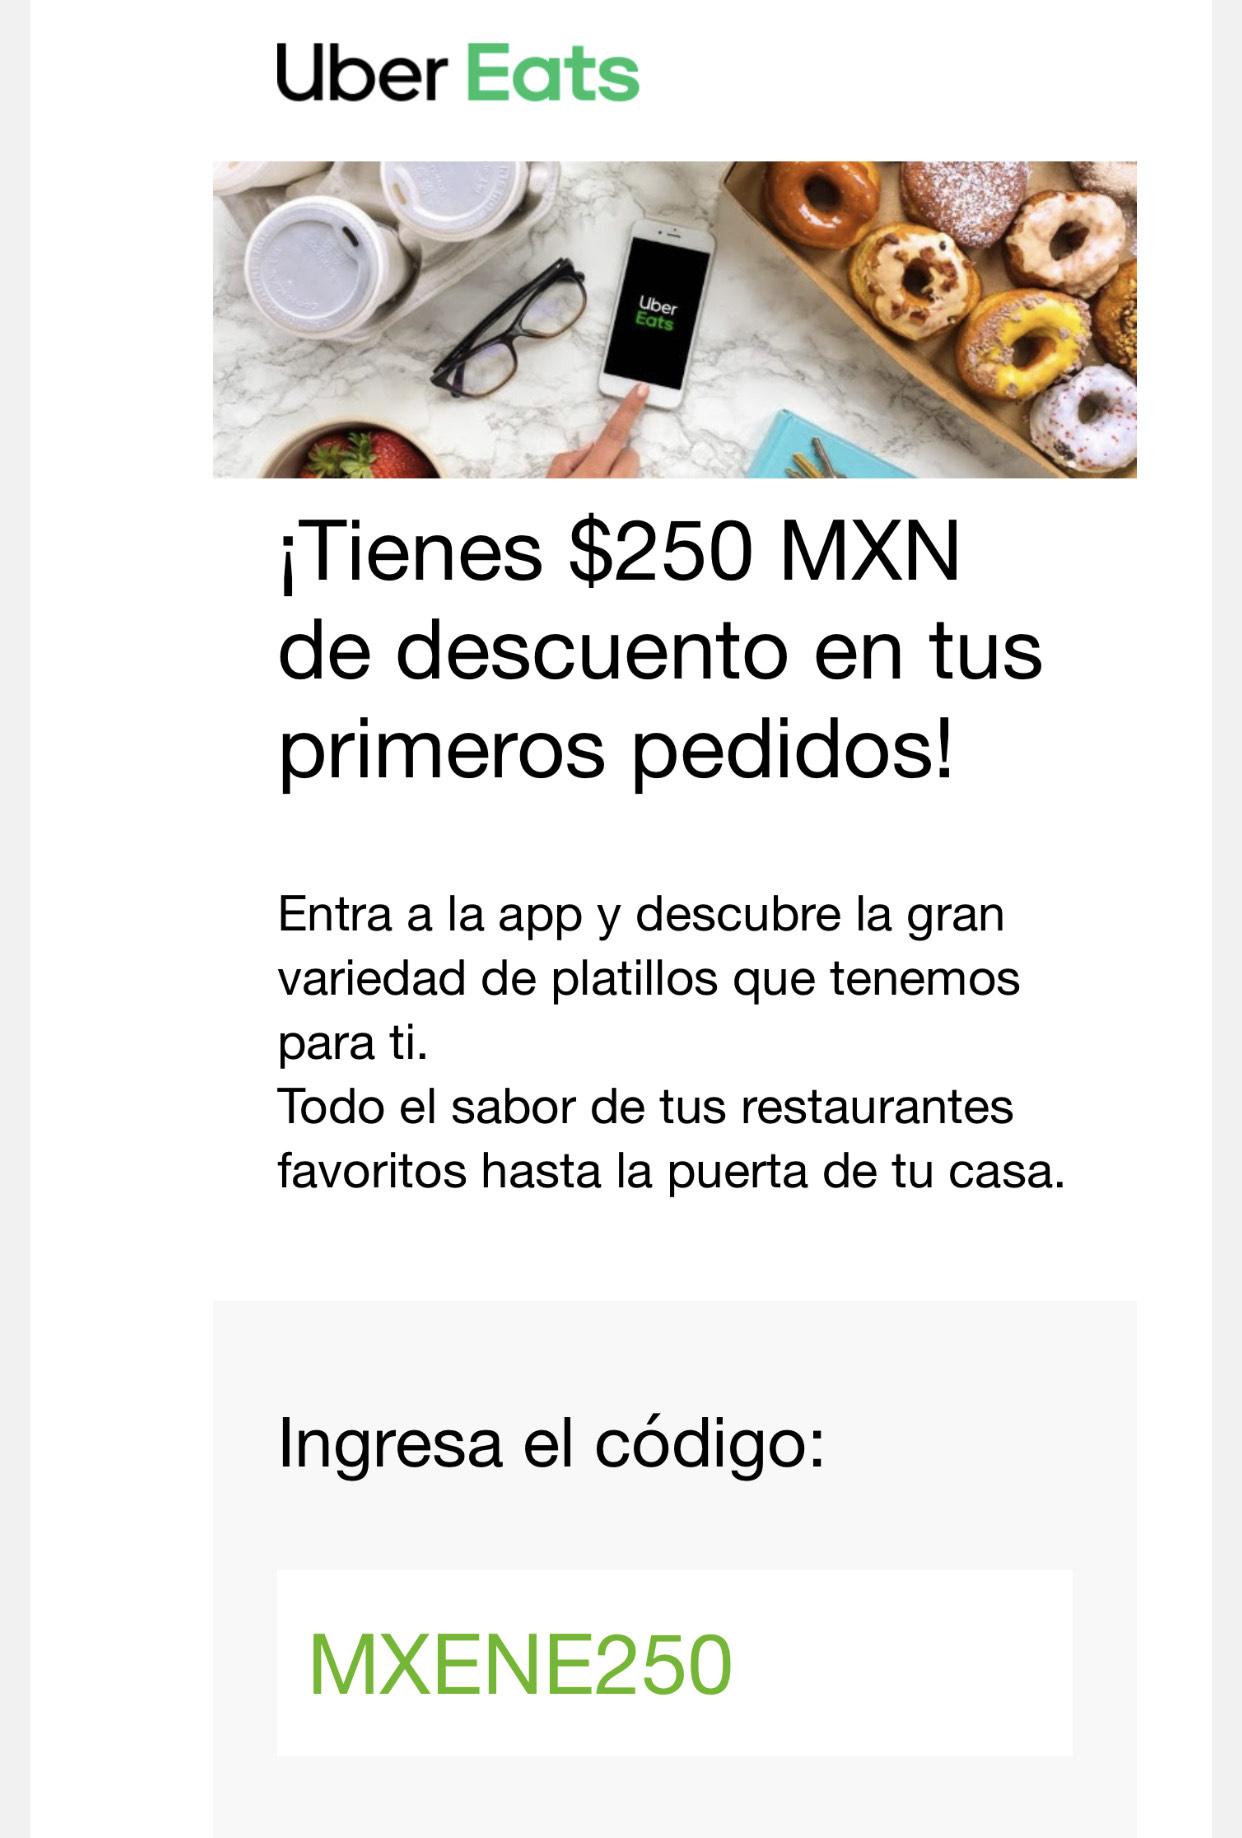 Descuento de $250 primer pedido Uber Eats